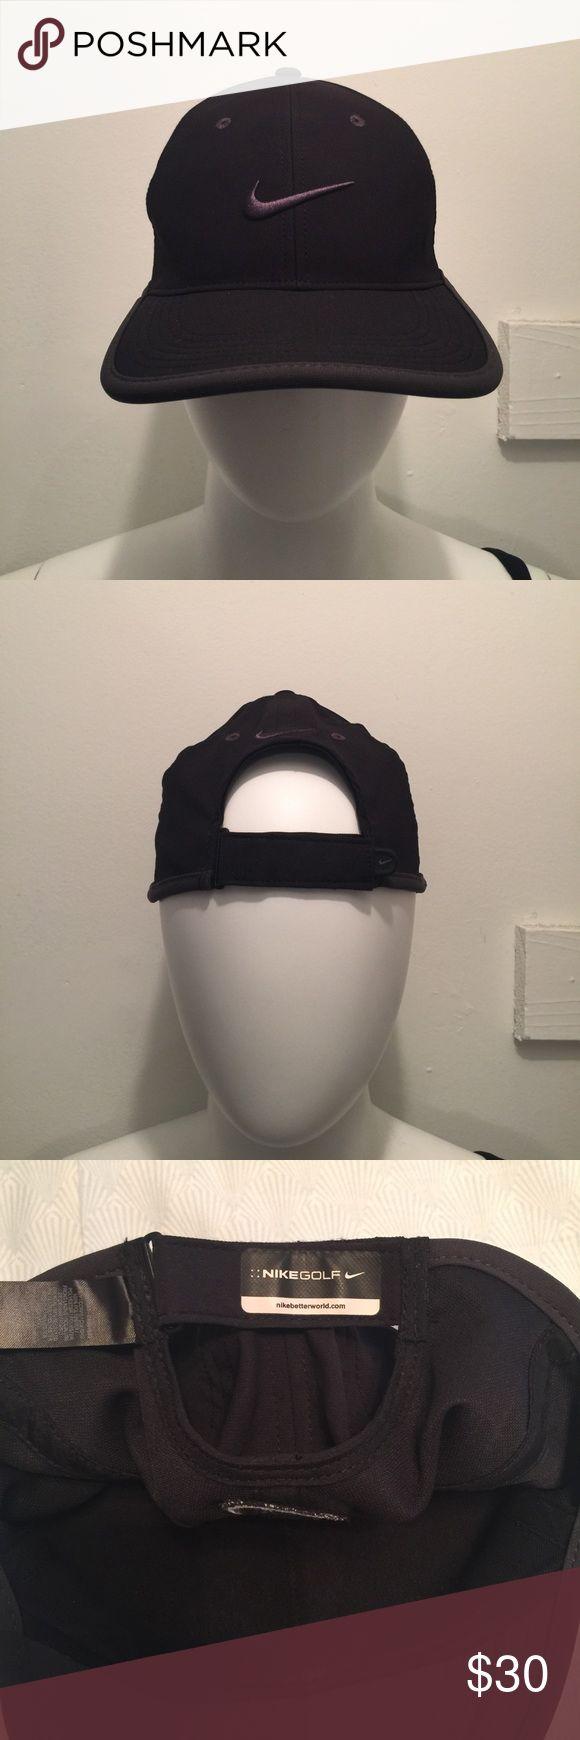 Nike black hat NIKE All Black Hat Nike Accessories Hats